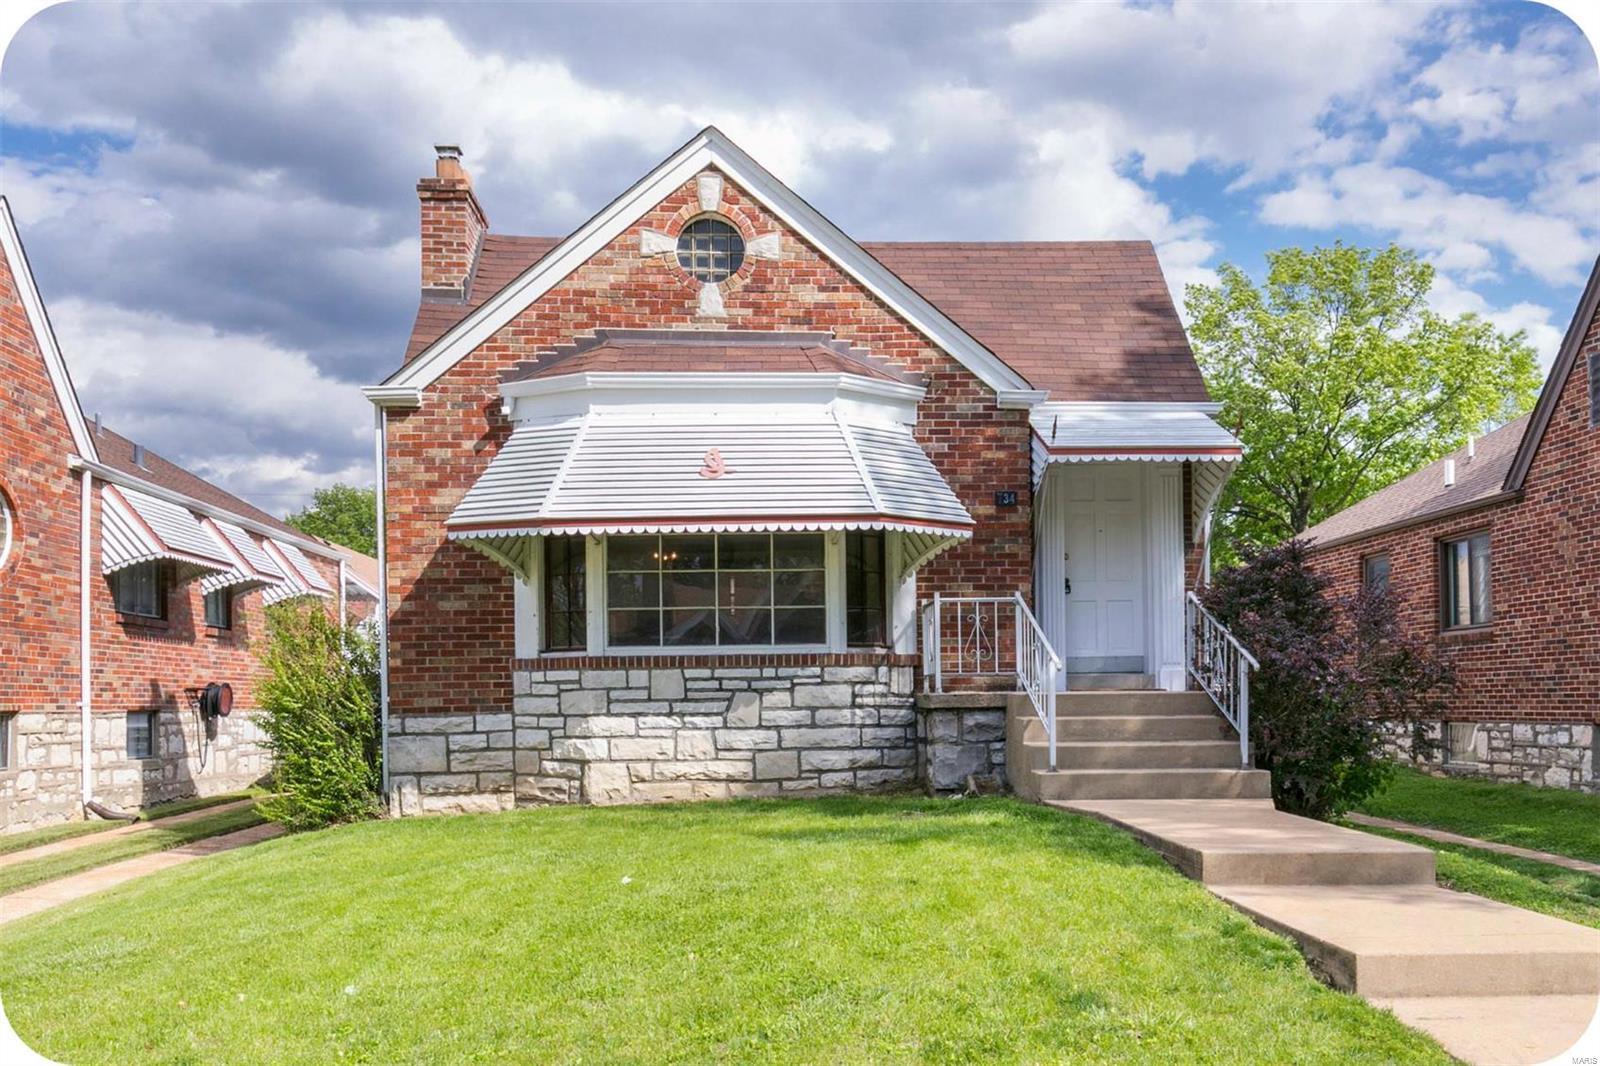 734 Bellavilla Property Photo - St Louis, MO real estate listing